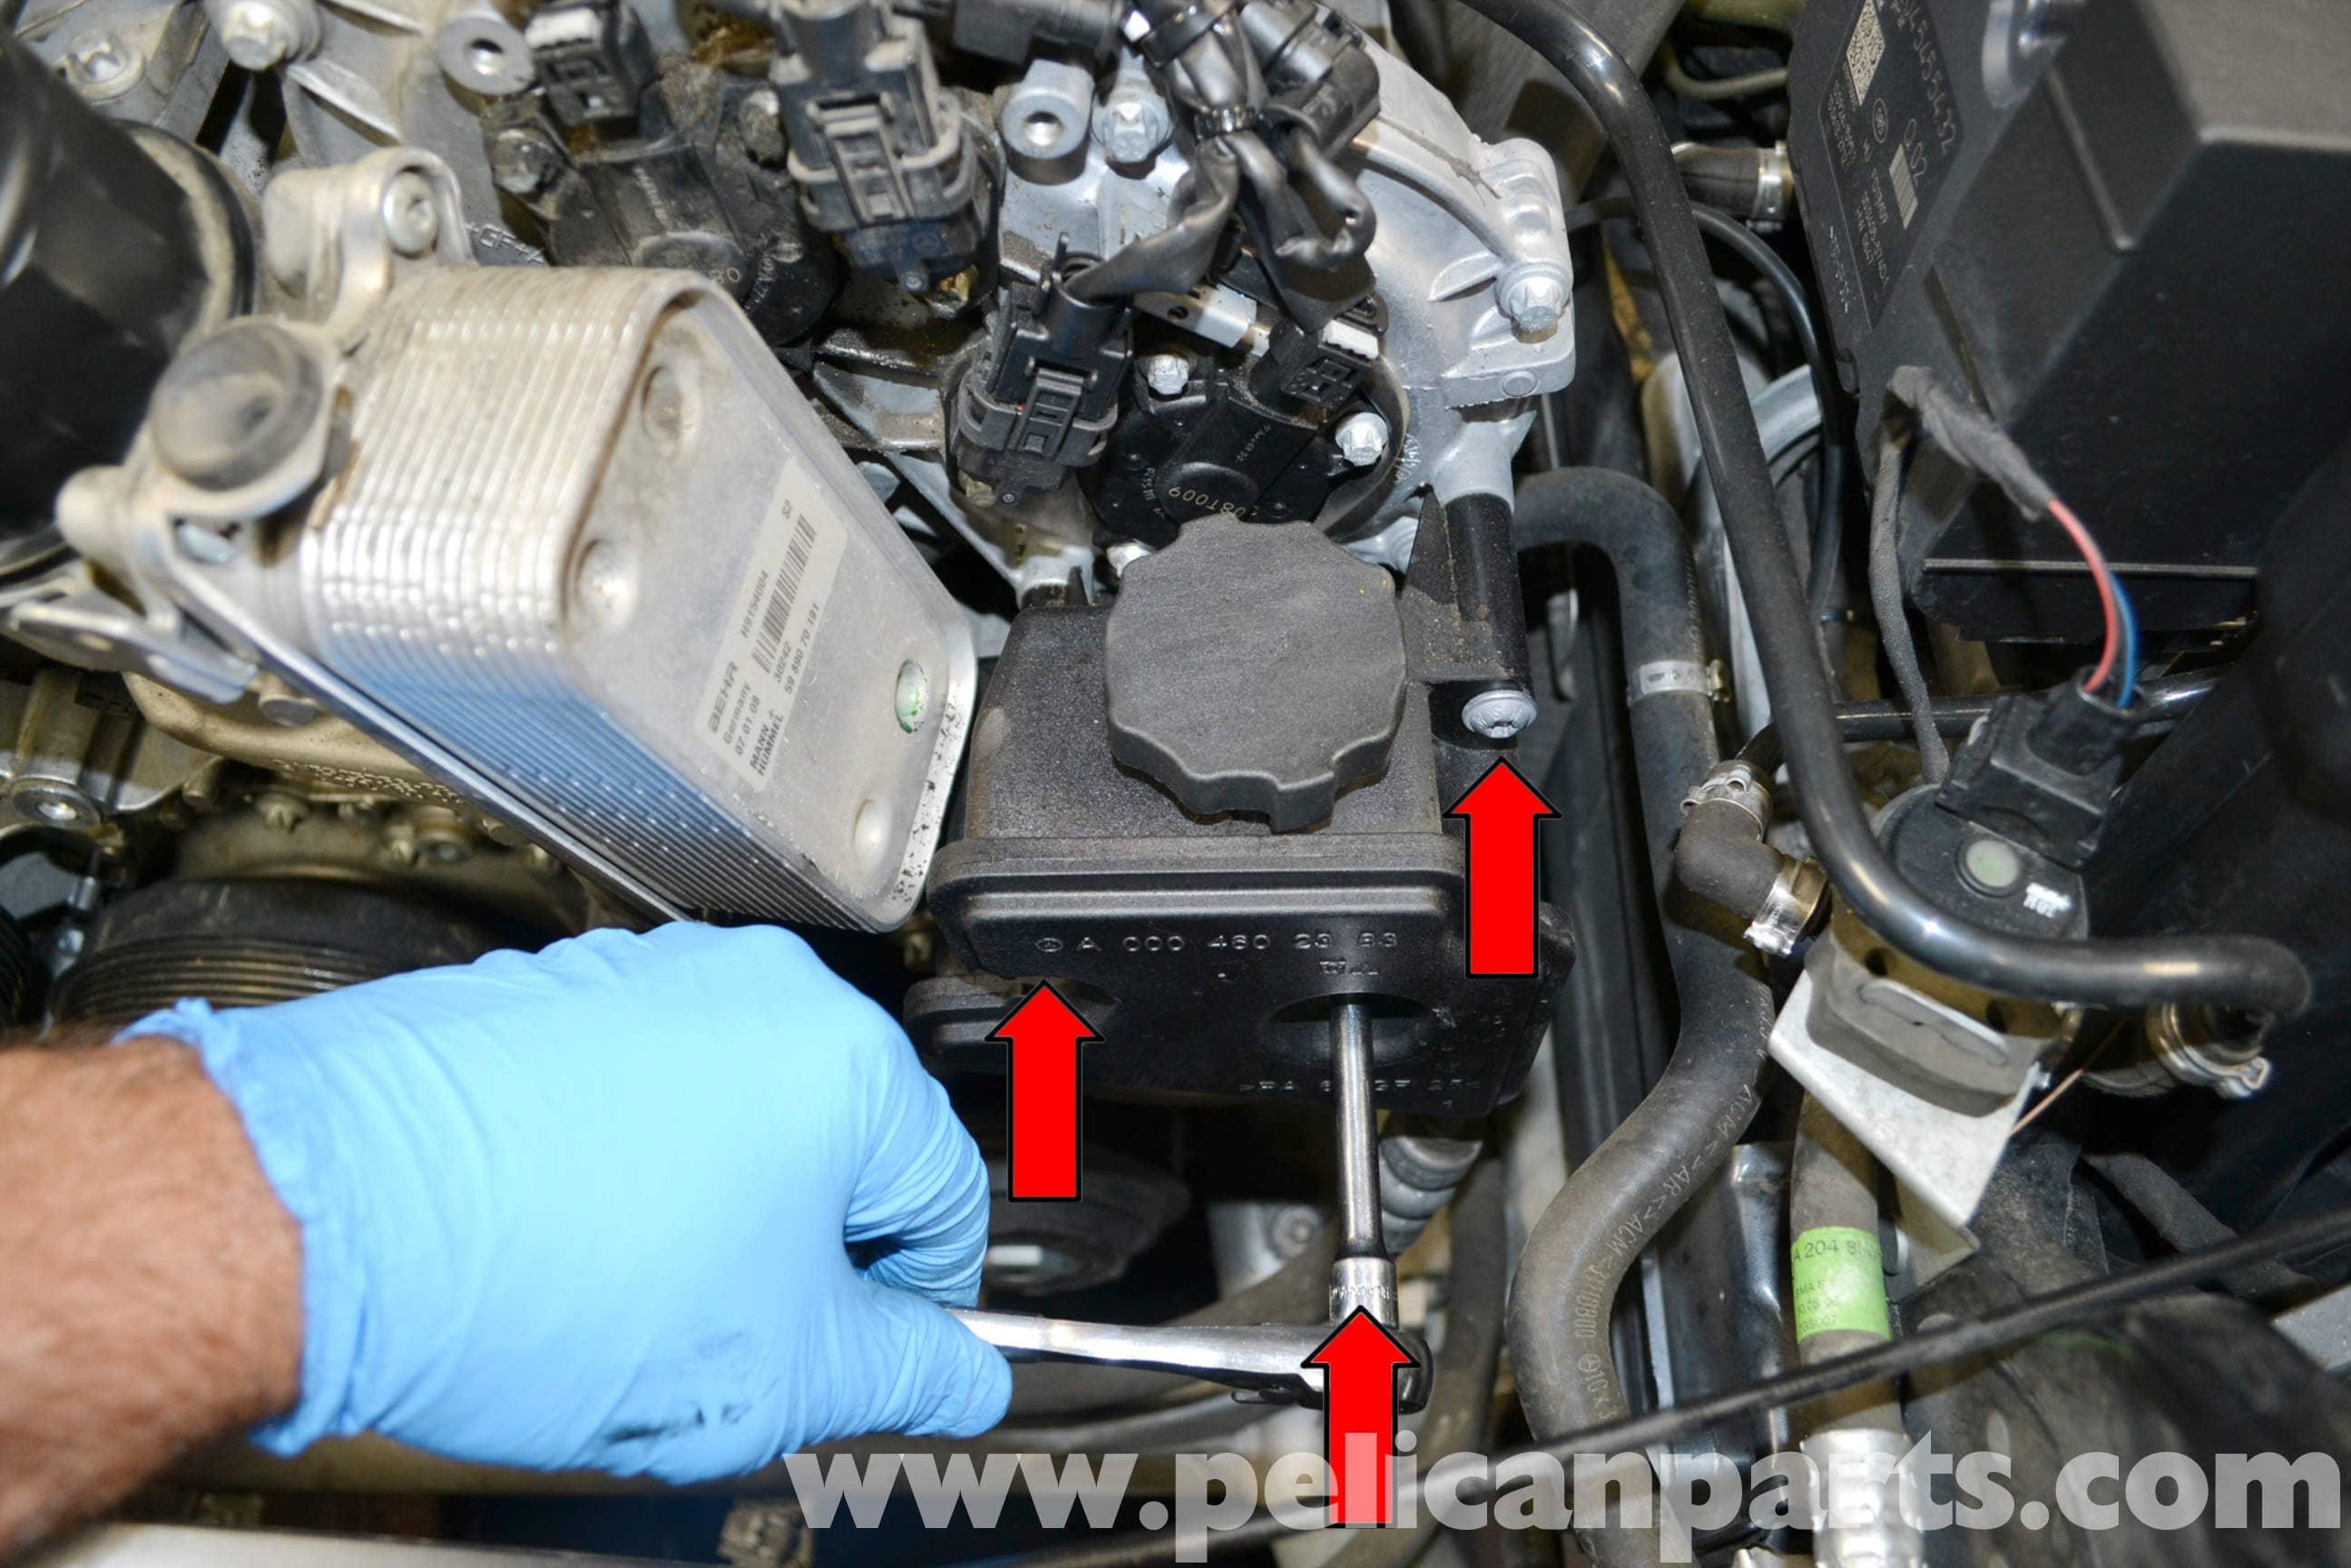 Mercedes benz w204 power steering reservoir replacement for Mercedes benz power steering fluid